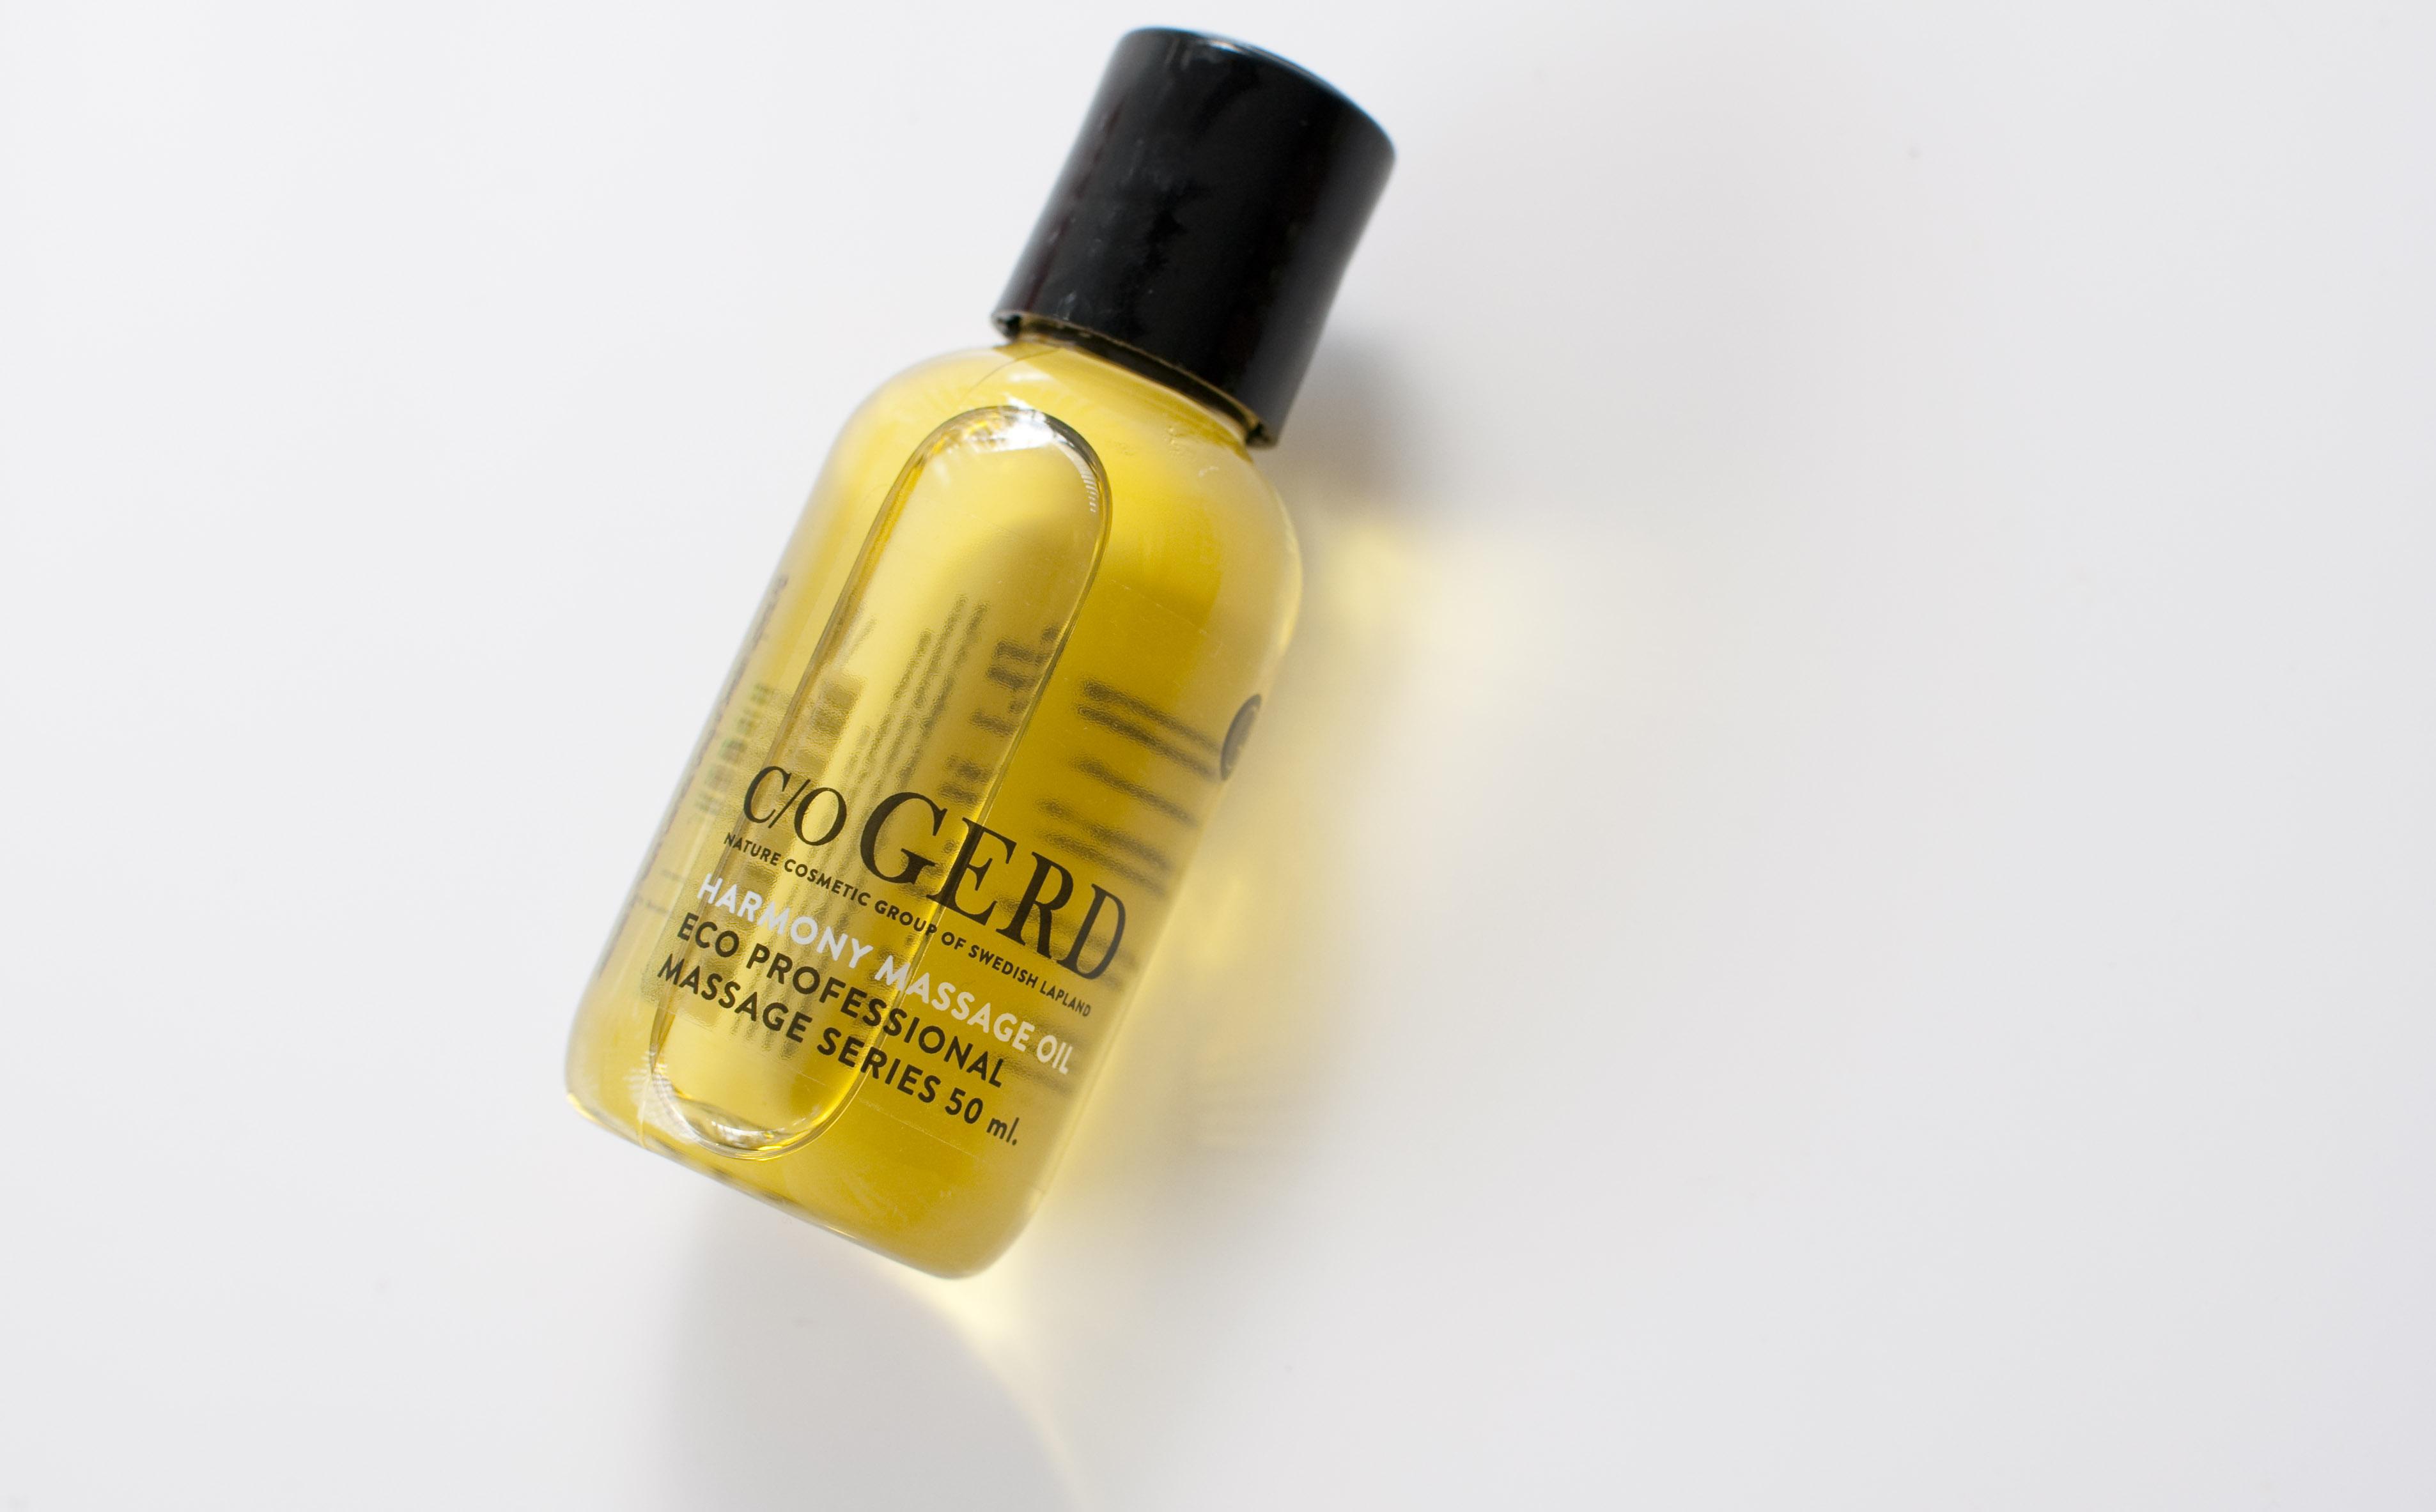 review C/O Gerd harmony massage oil